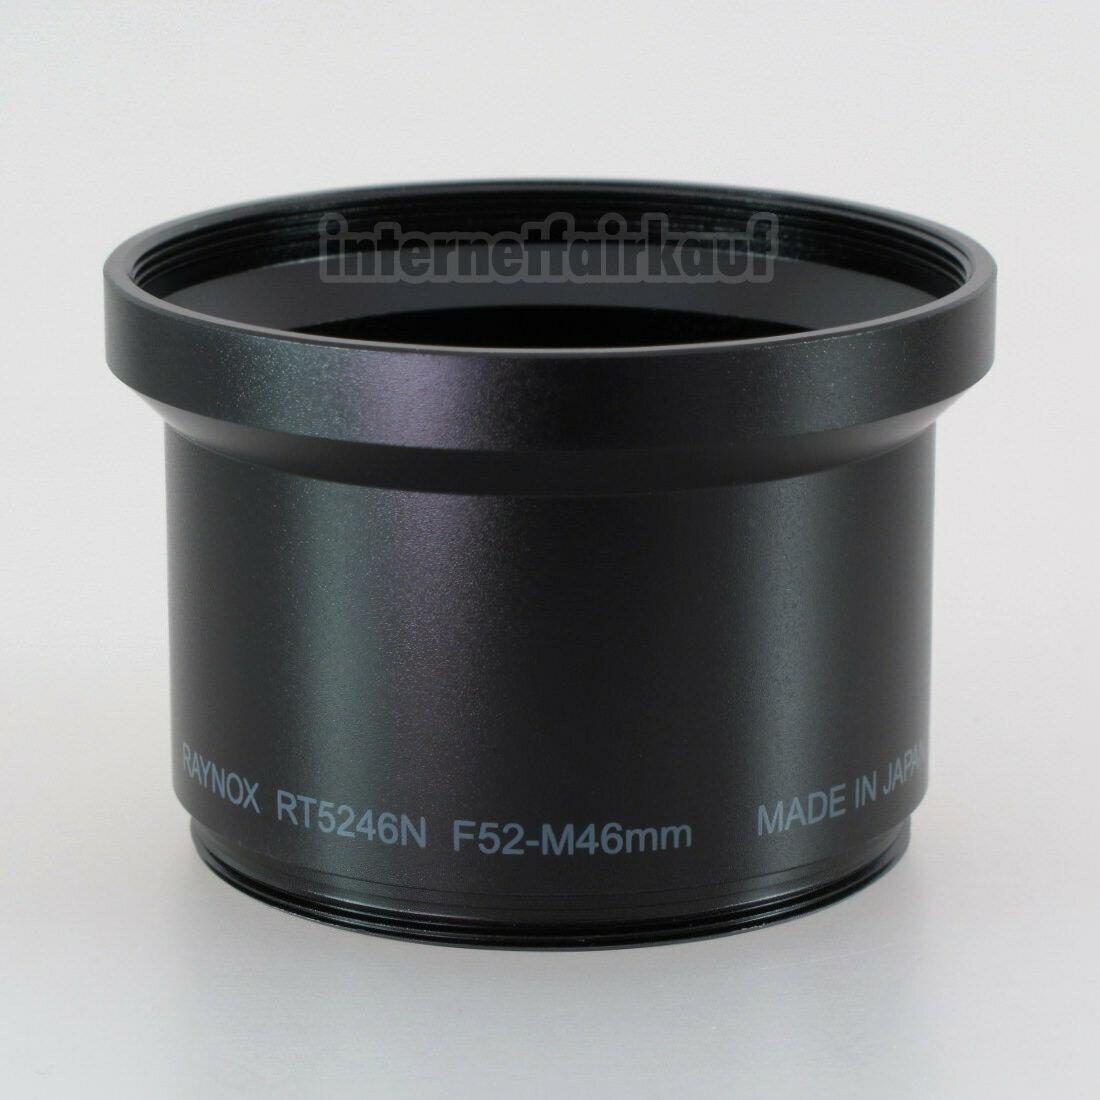 Raynox RT5246N Adapter Tubus für Nikon Coolpix 5000